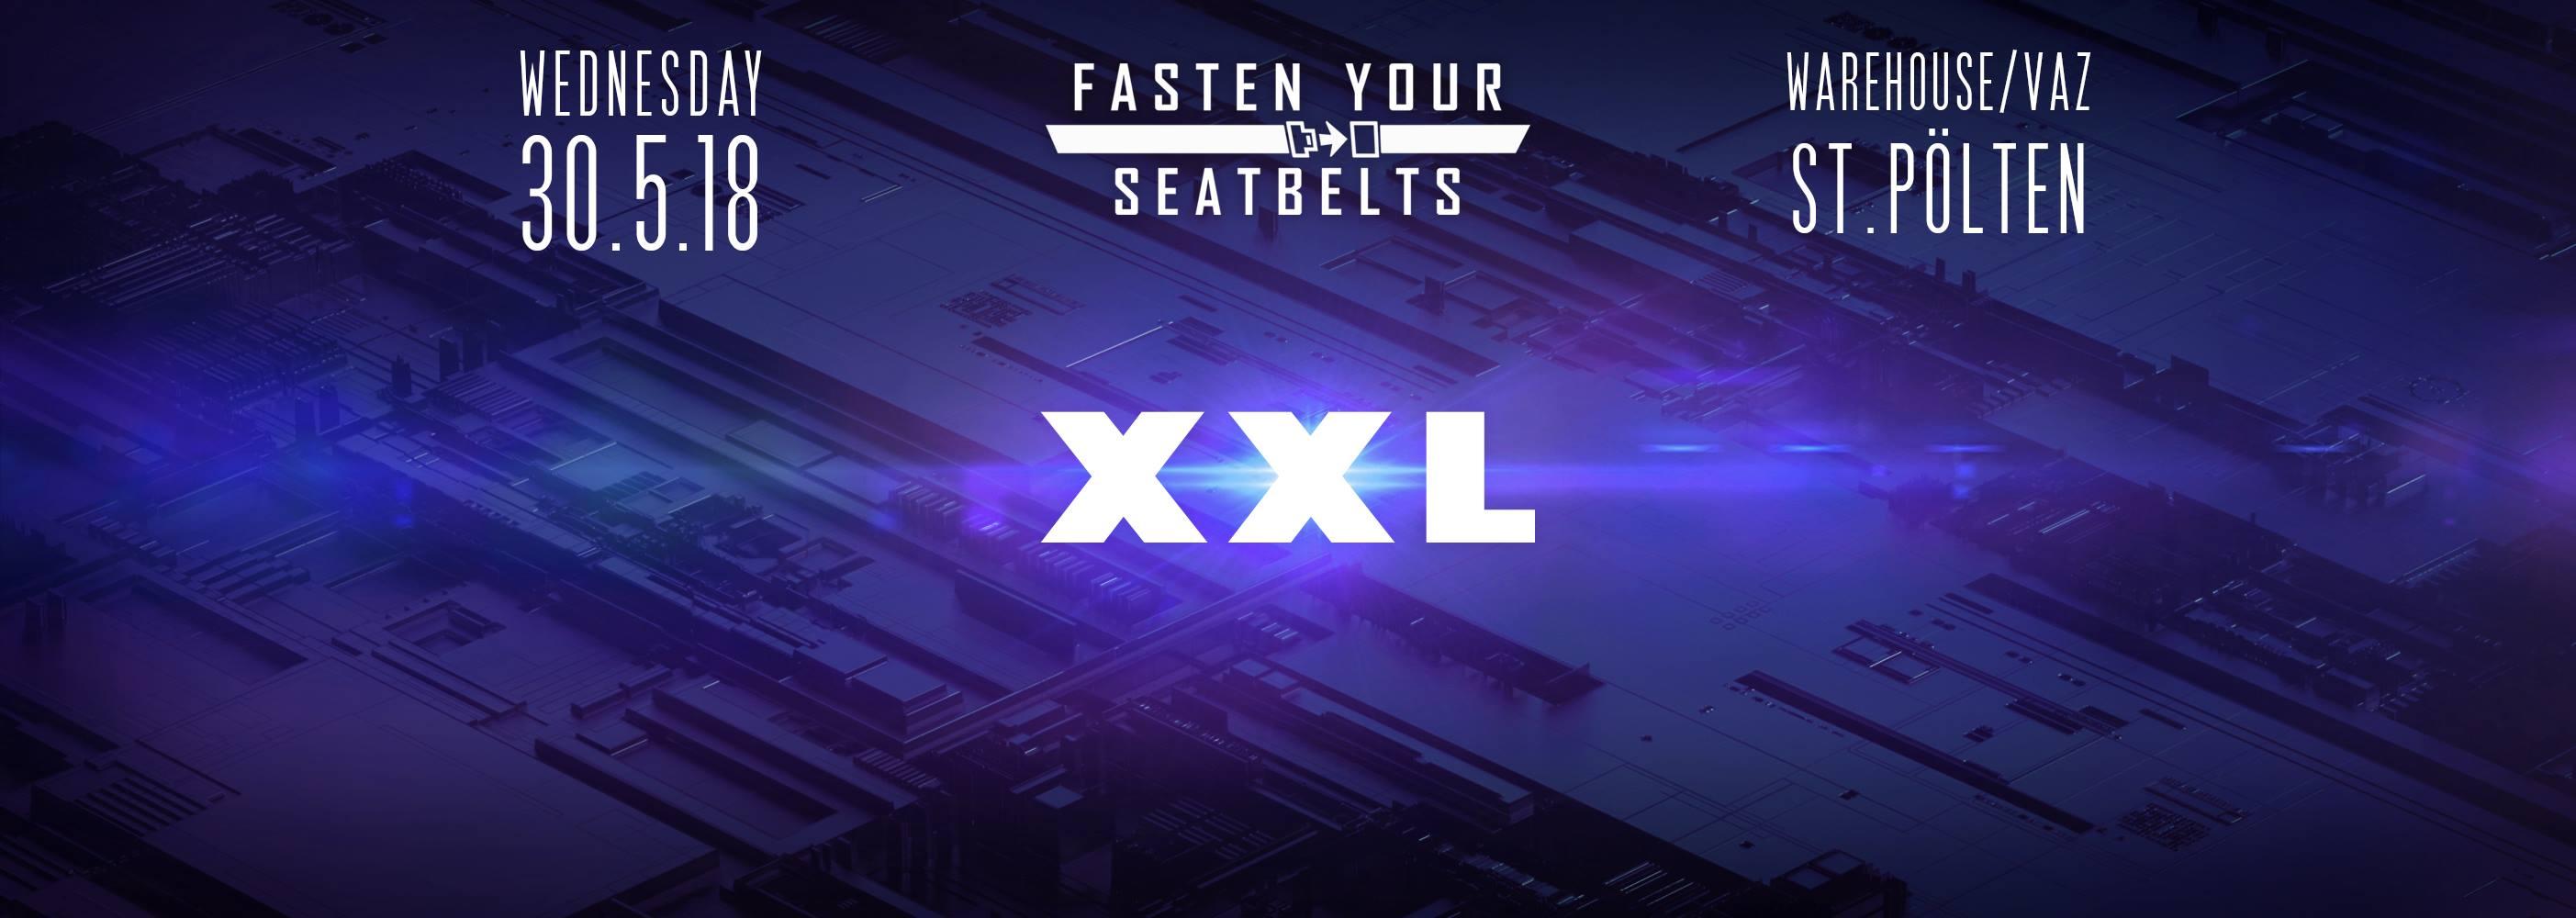 Fasten Your Seatbelts XXL